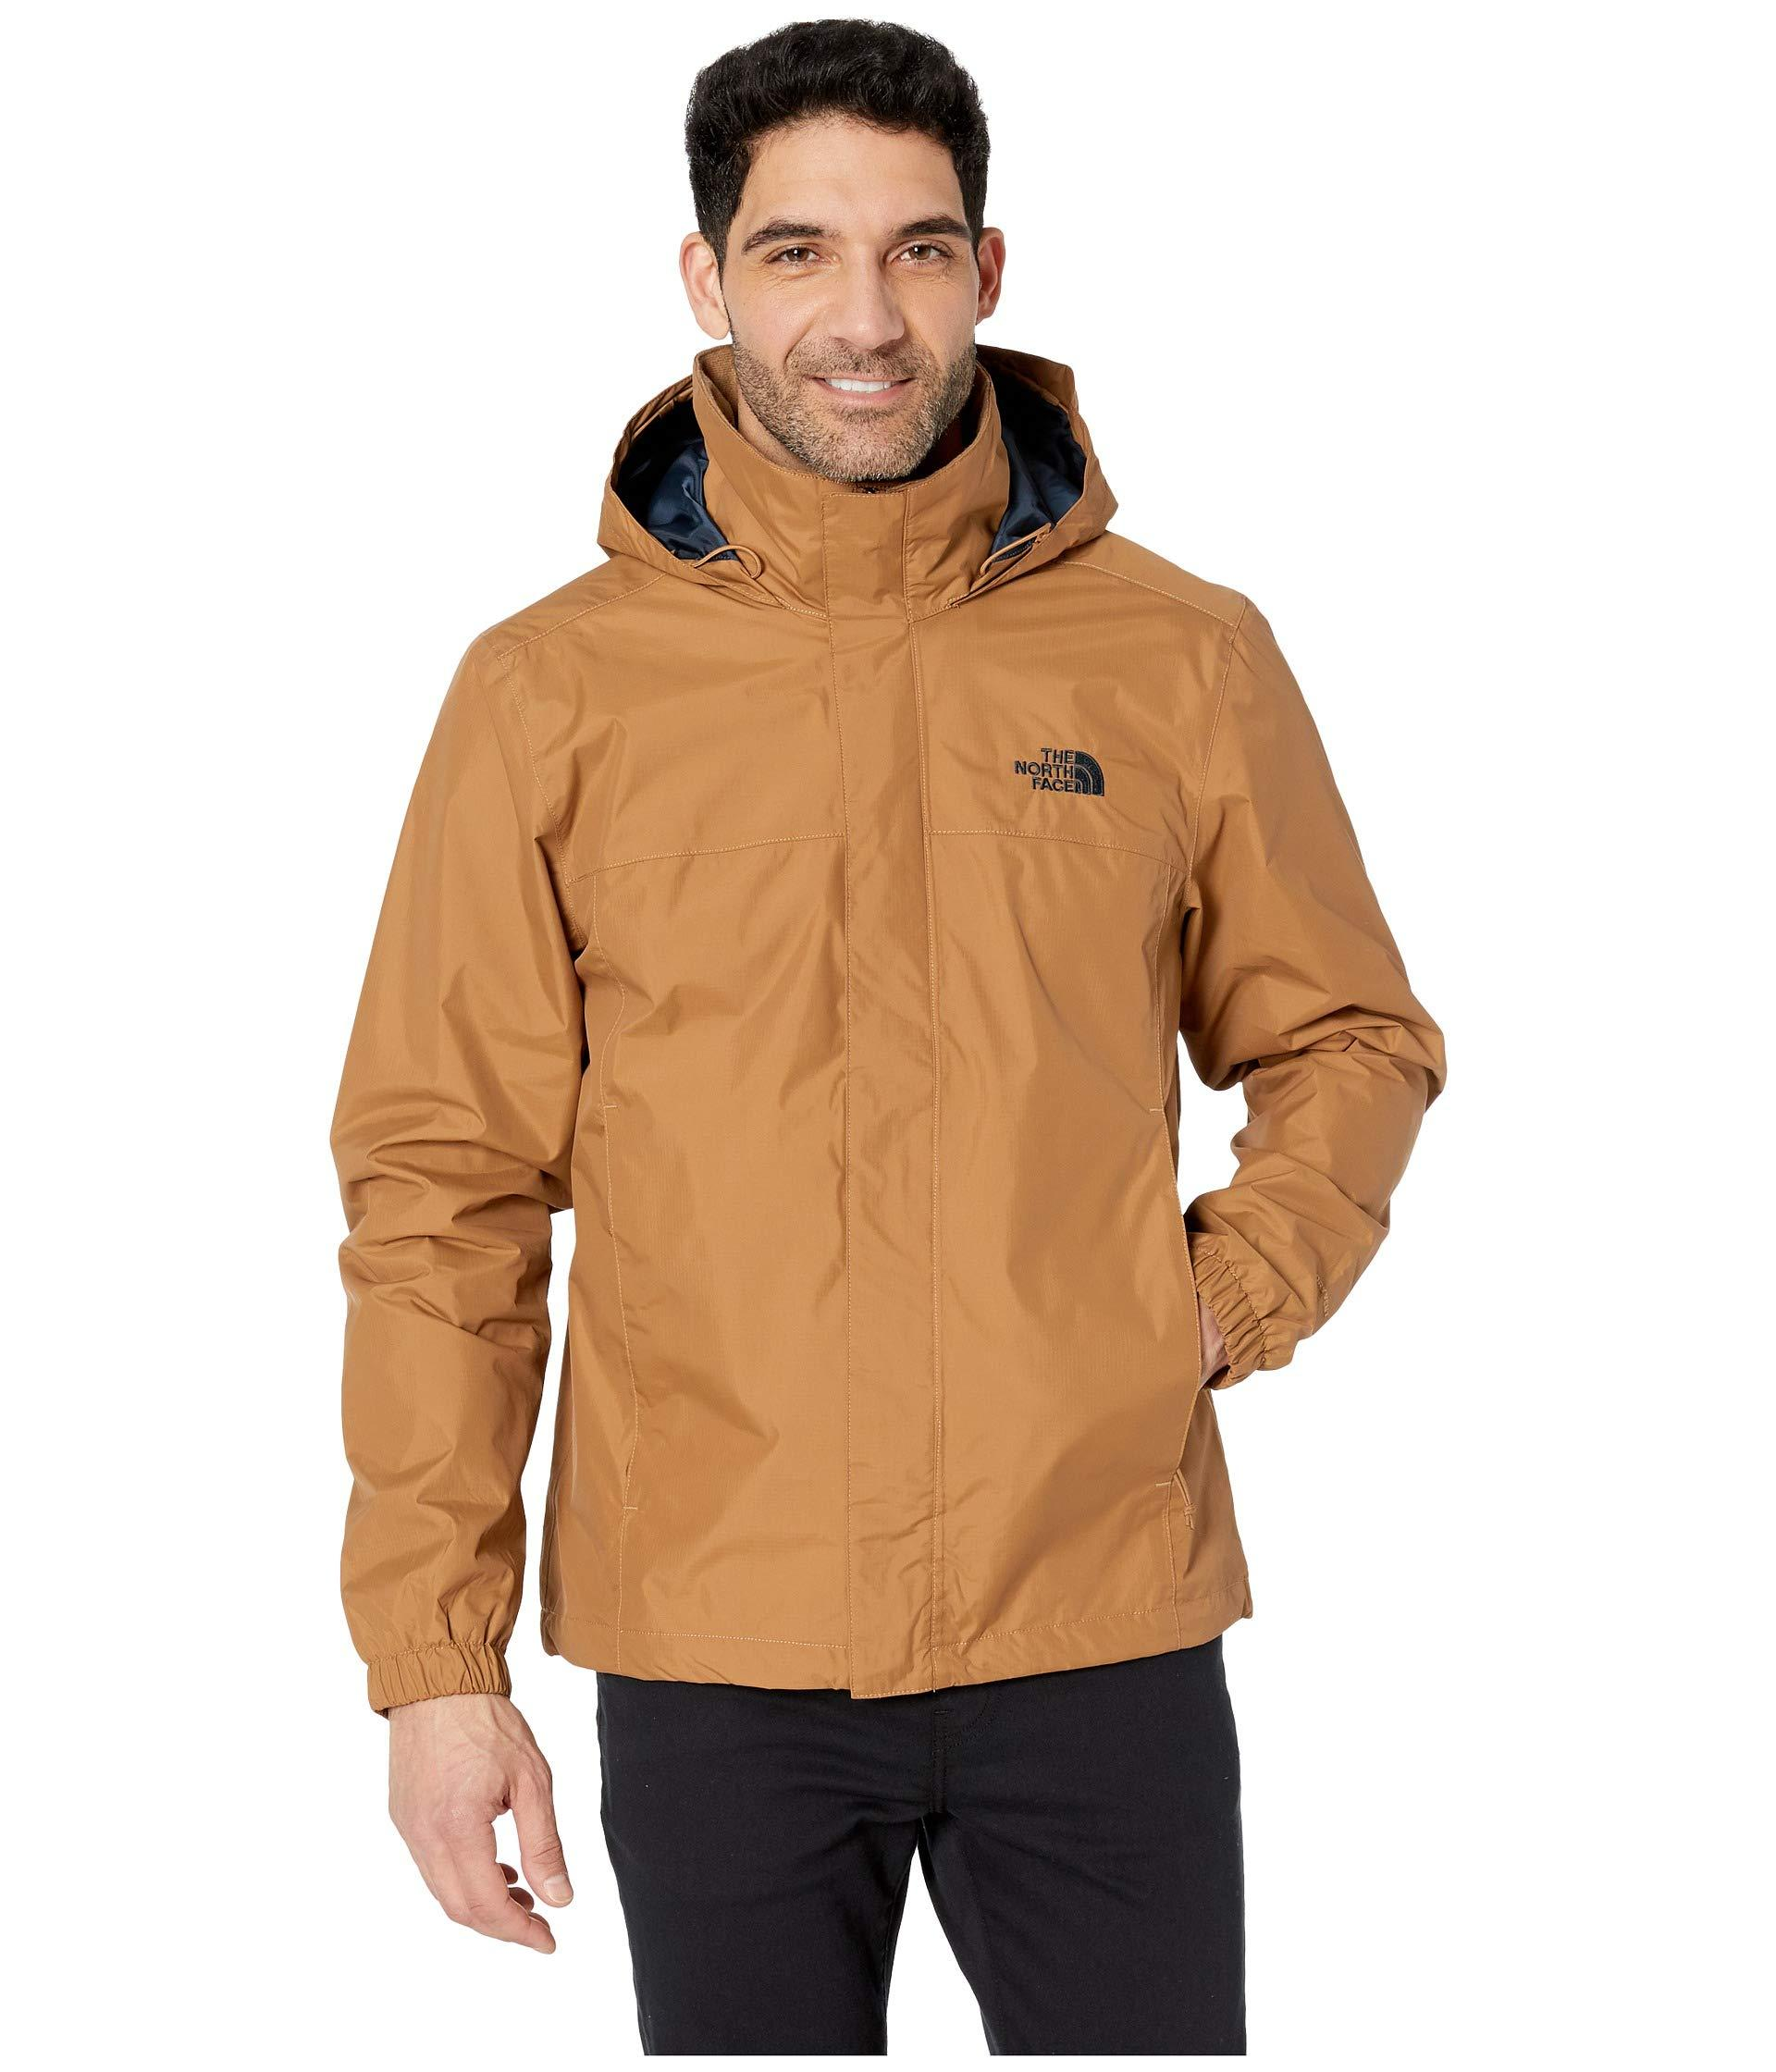 9bf52c2f5 Men's Resolve 2 Jacket